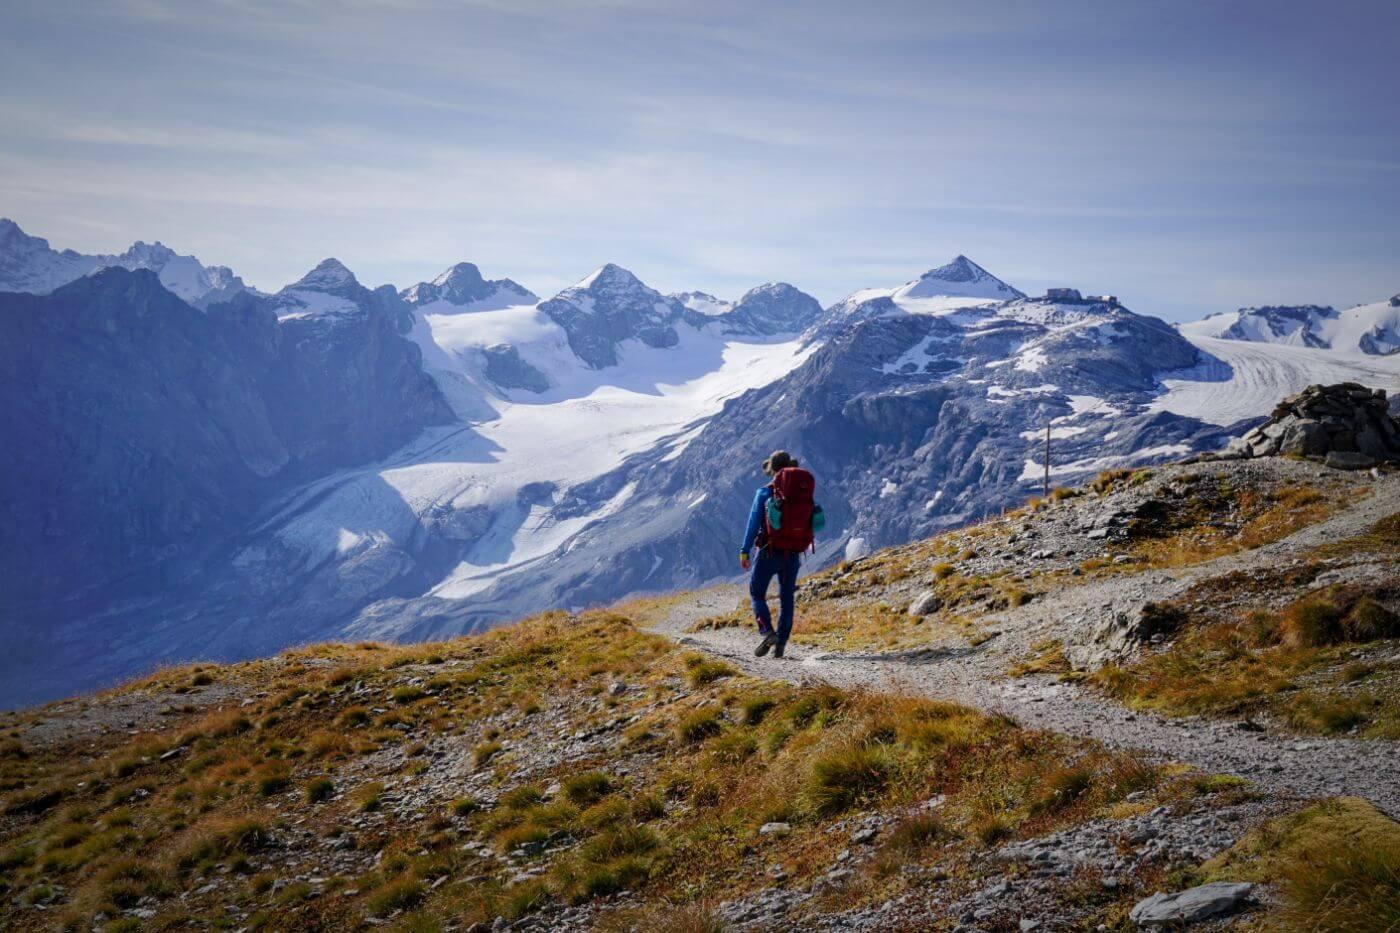 Stelvio Pass to Stelvio / Stilfs, Ortler High Trail Stage 1, South Tyrol